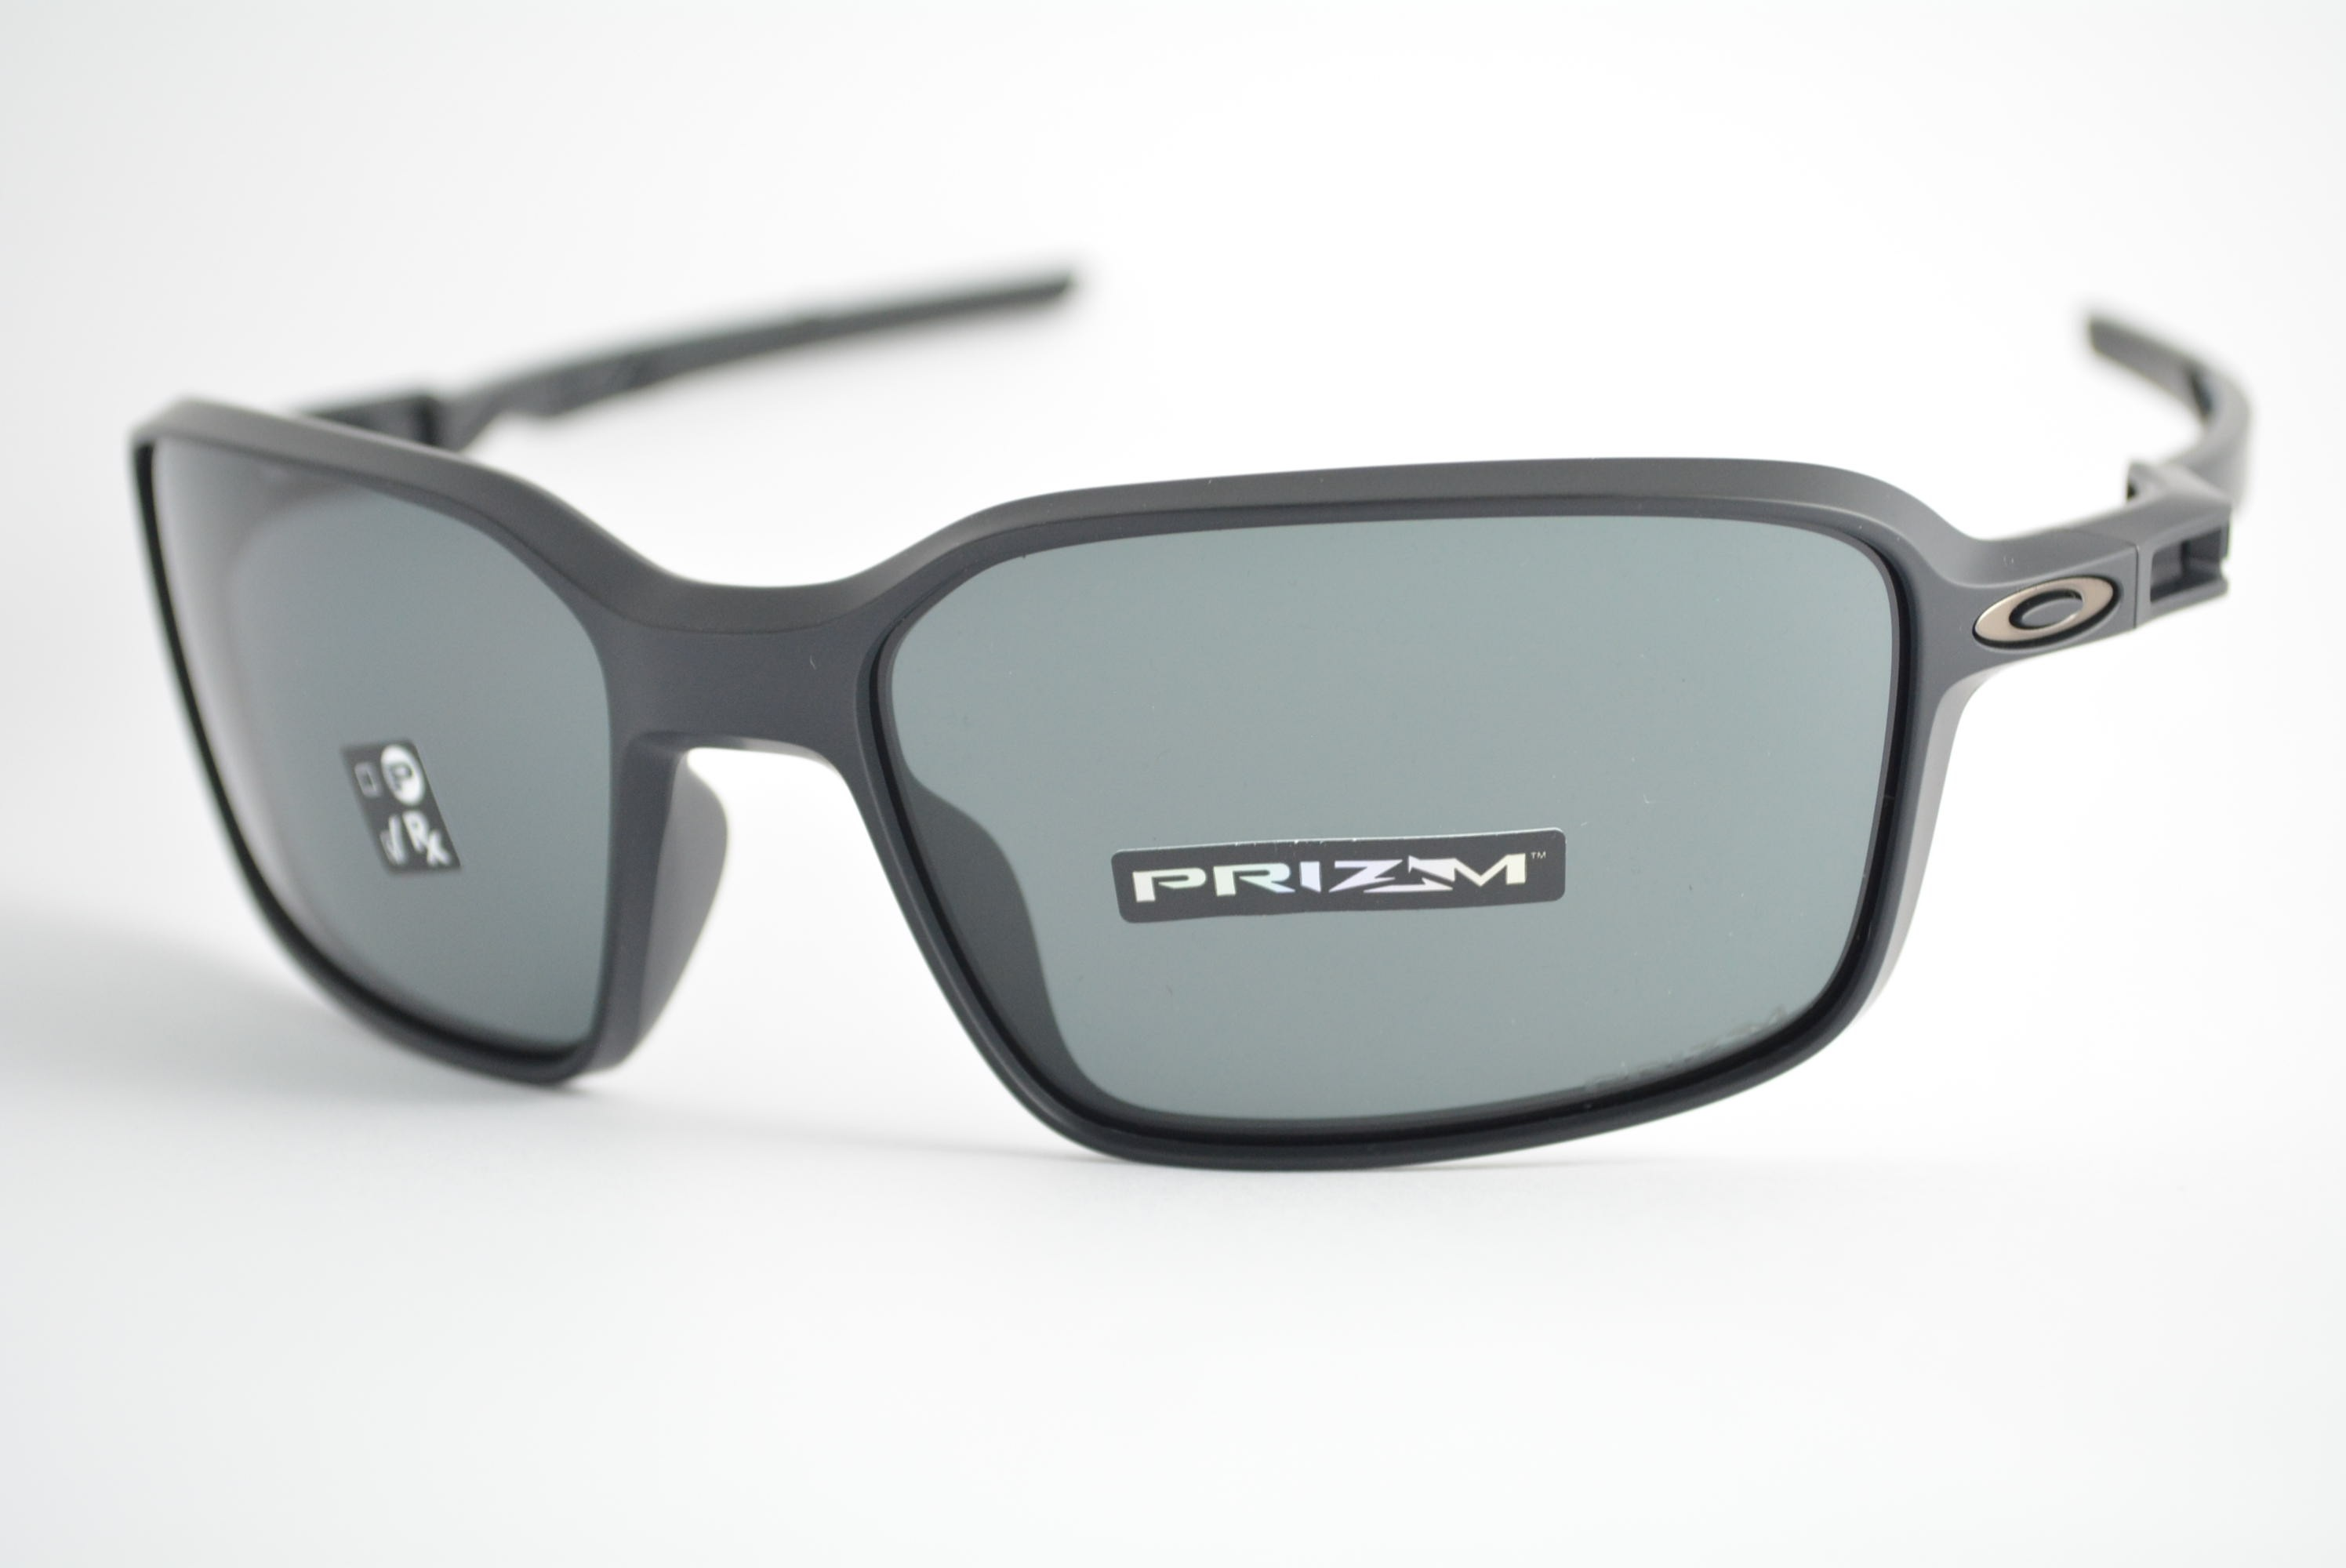 7d0bde0c213 óculos de sol Oakley mod Siphon matte black w prizm grey 9429-0164 ...